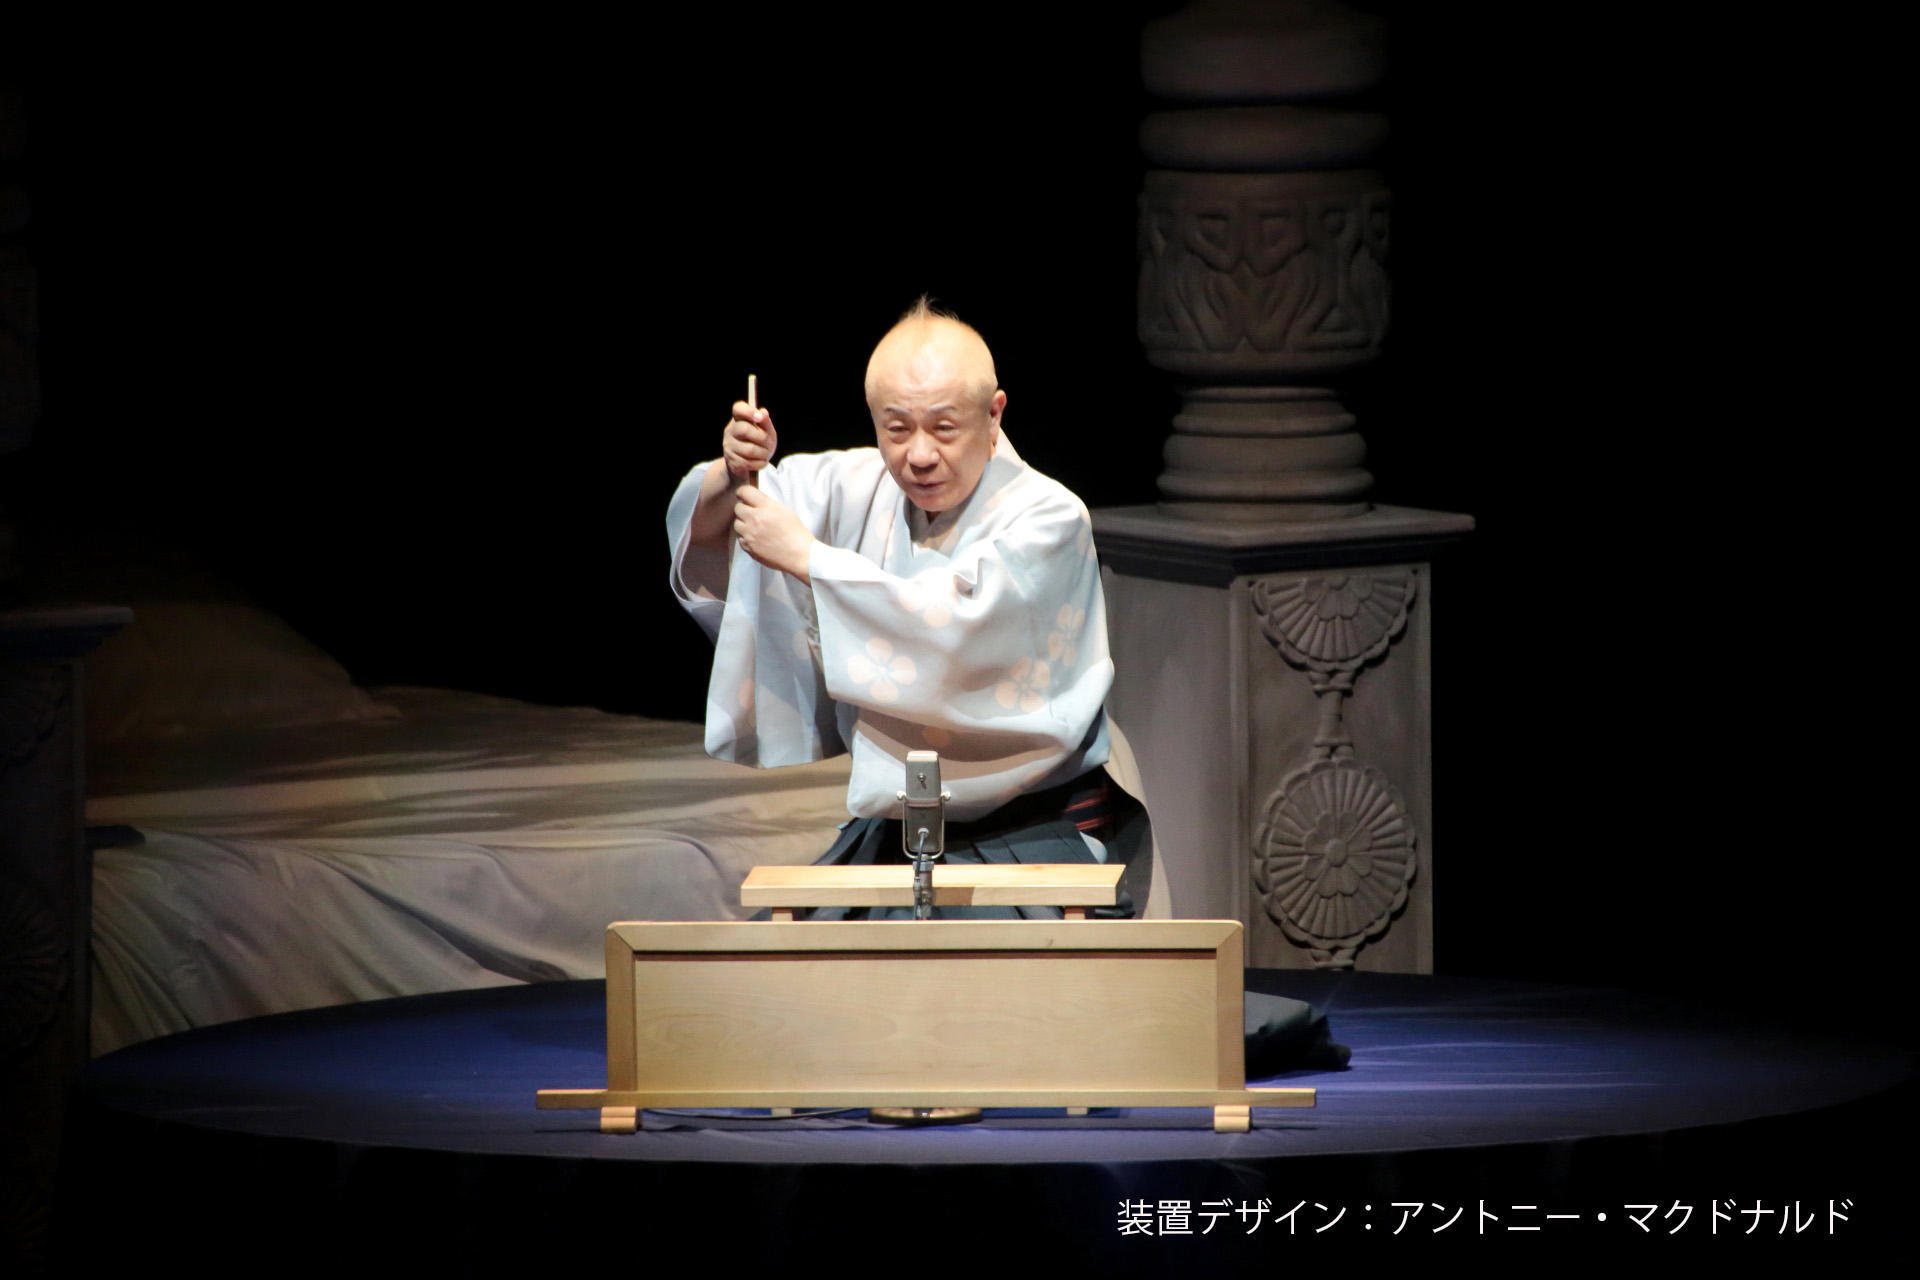 http://news.yoshimoto.co.jp/20160731003942-6afb39f2e81c35b7a36ec11adcf554aaf9fc9f5b.jpg